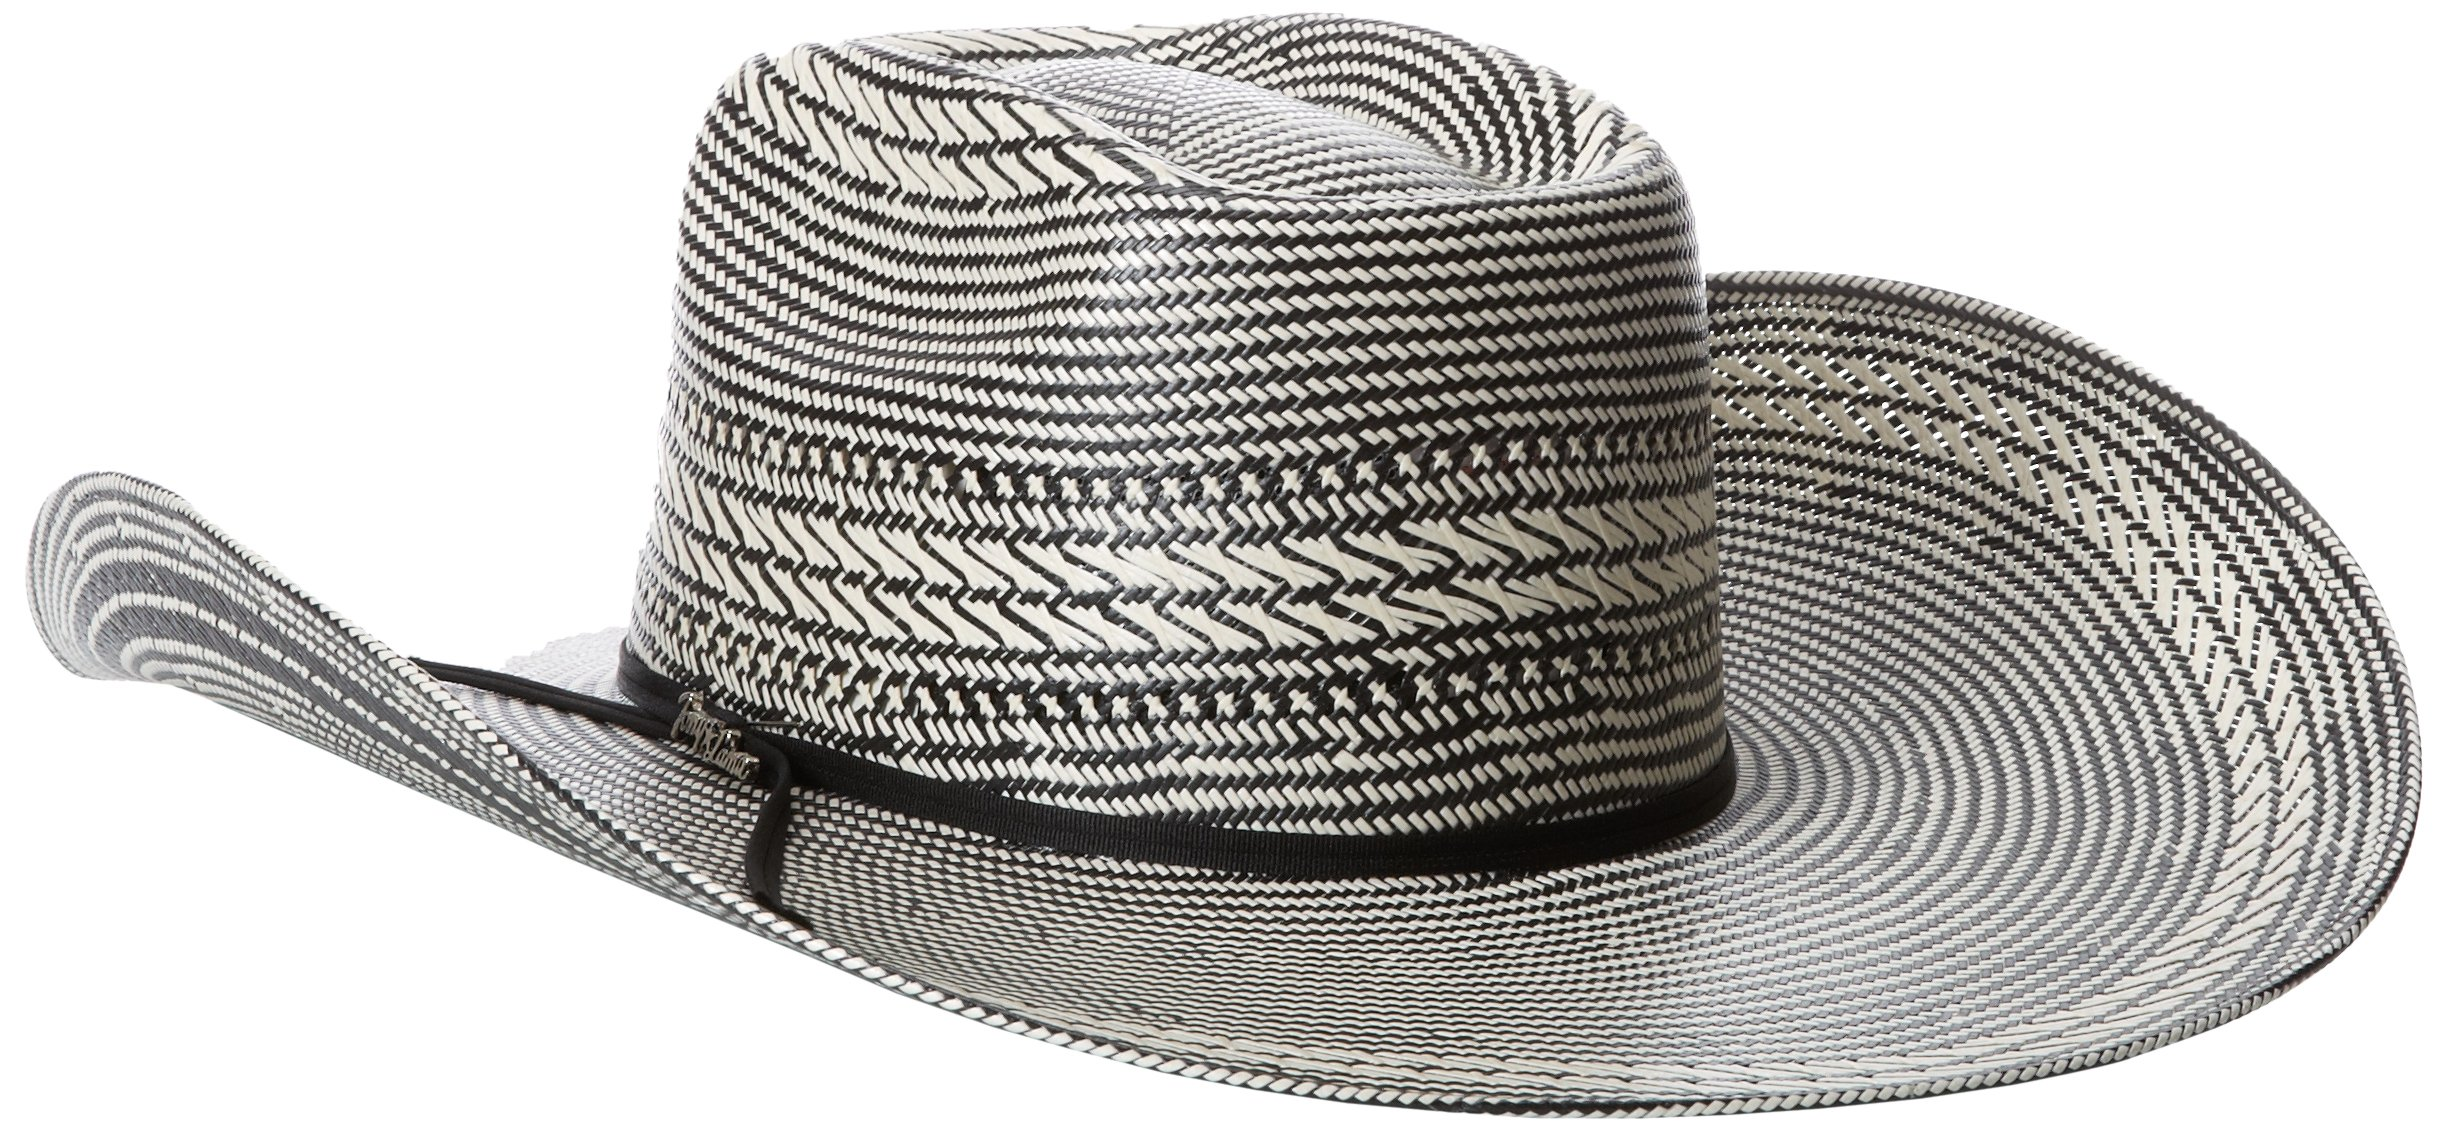 Tony Lama Men's Vegas Black White Straw Cowboy Hat, Black/White, 7